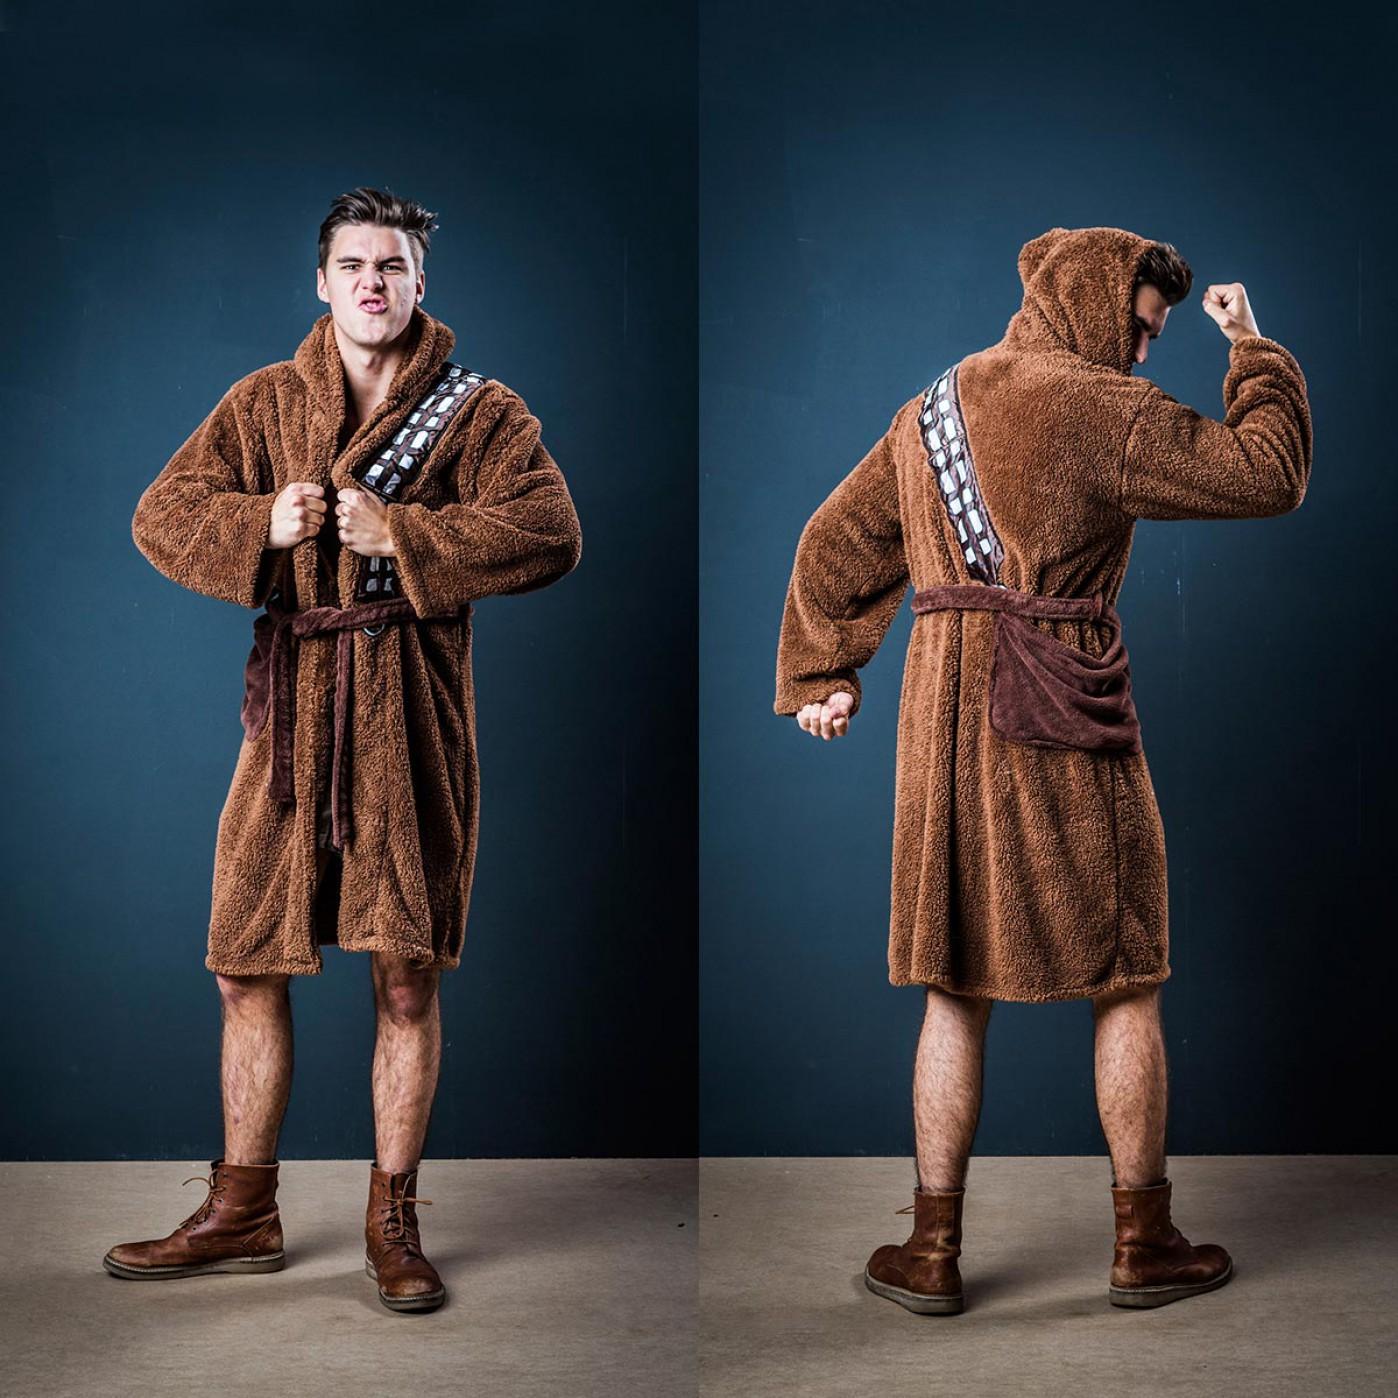 peignoir-star-wars-chewbacca-cadeaux-folies-site-cadeau-homme-geek-fan-de-cinema